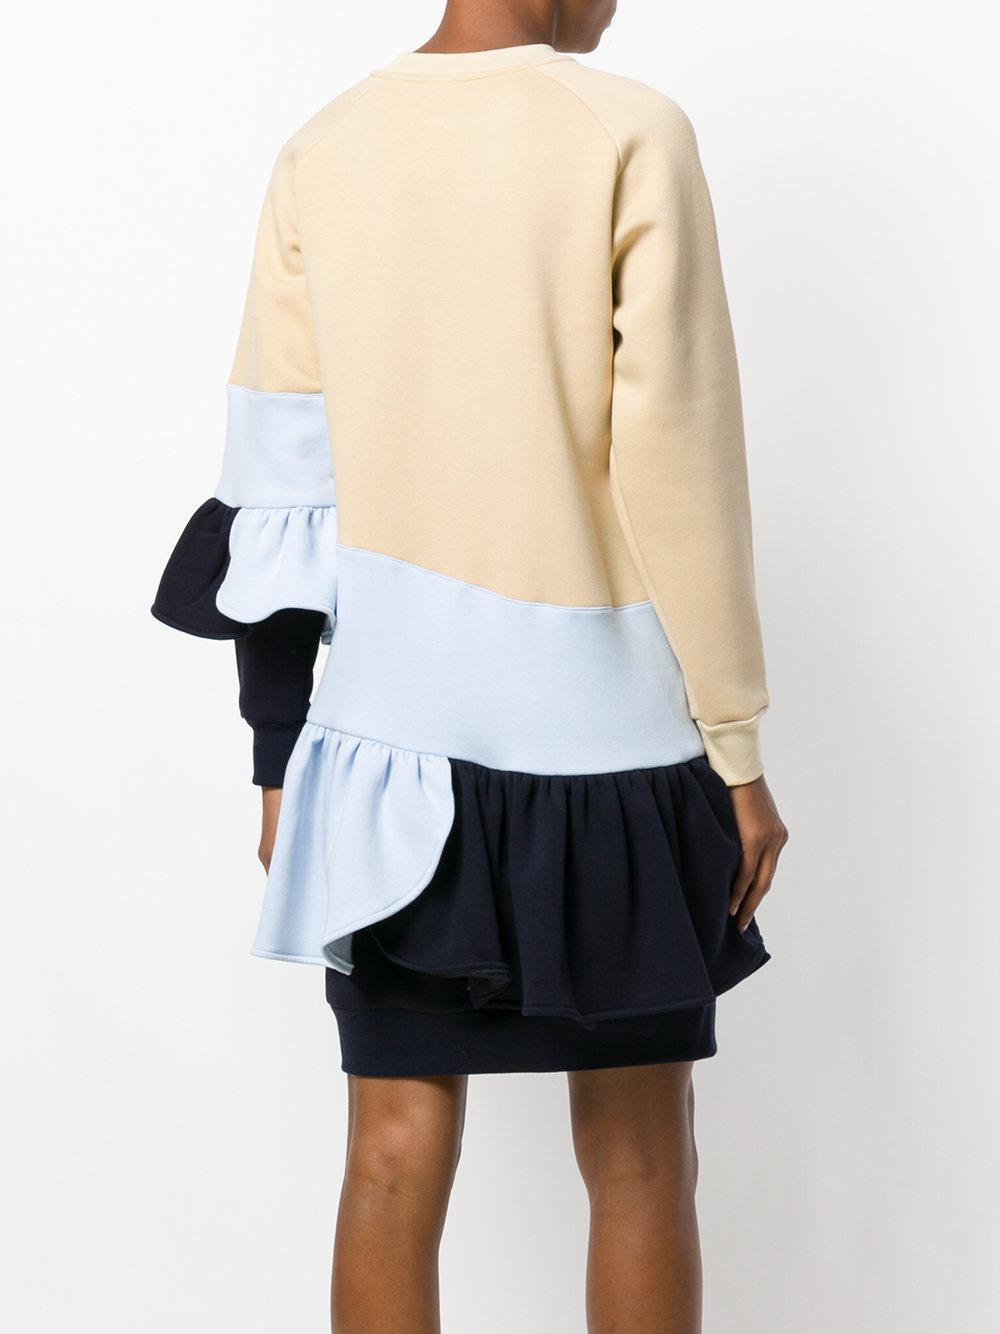 colour-block frill dress - Nude & Neutrals Ioana Ciolacu Pqbnu5